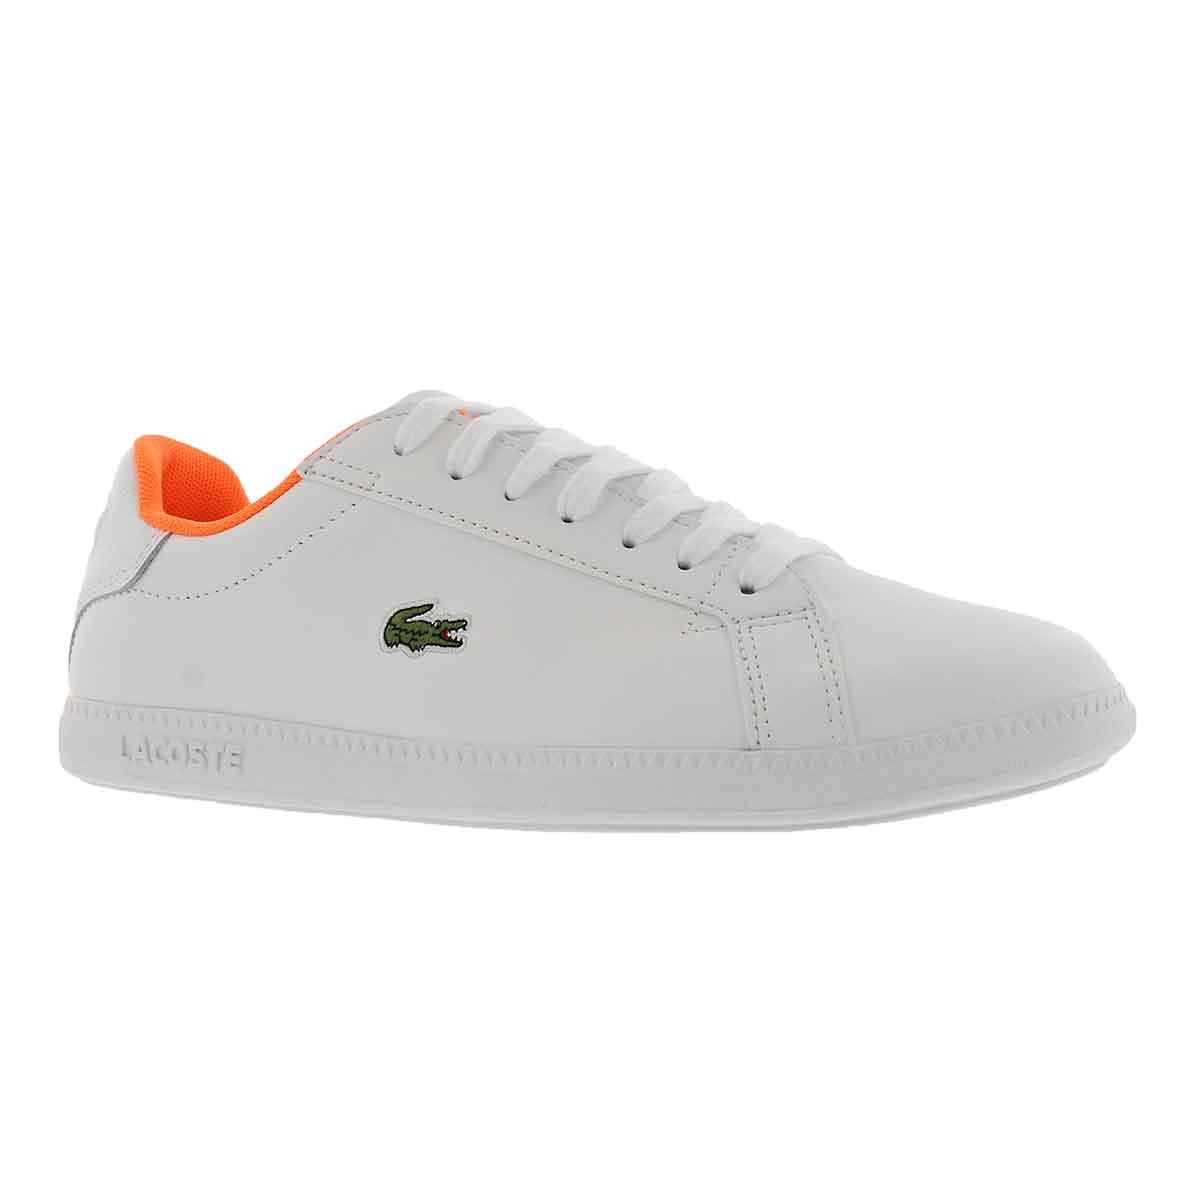 Women's GRADUATE 118 1 white/white sneaker